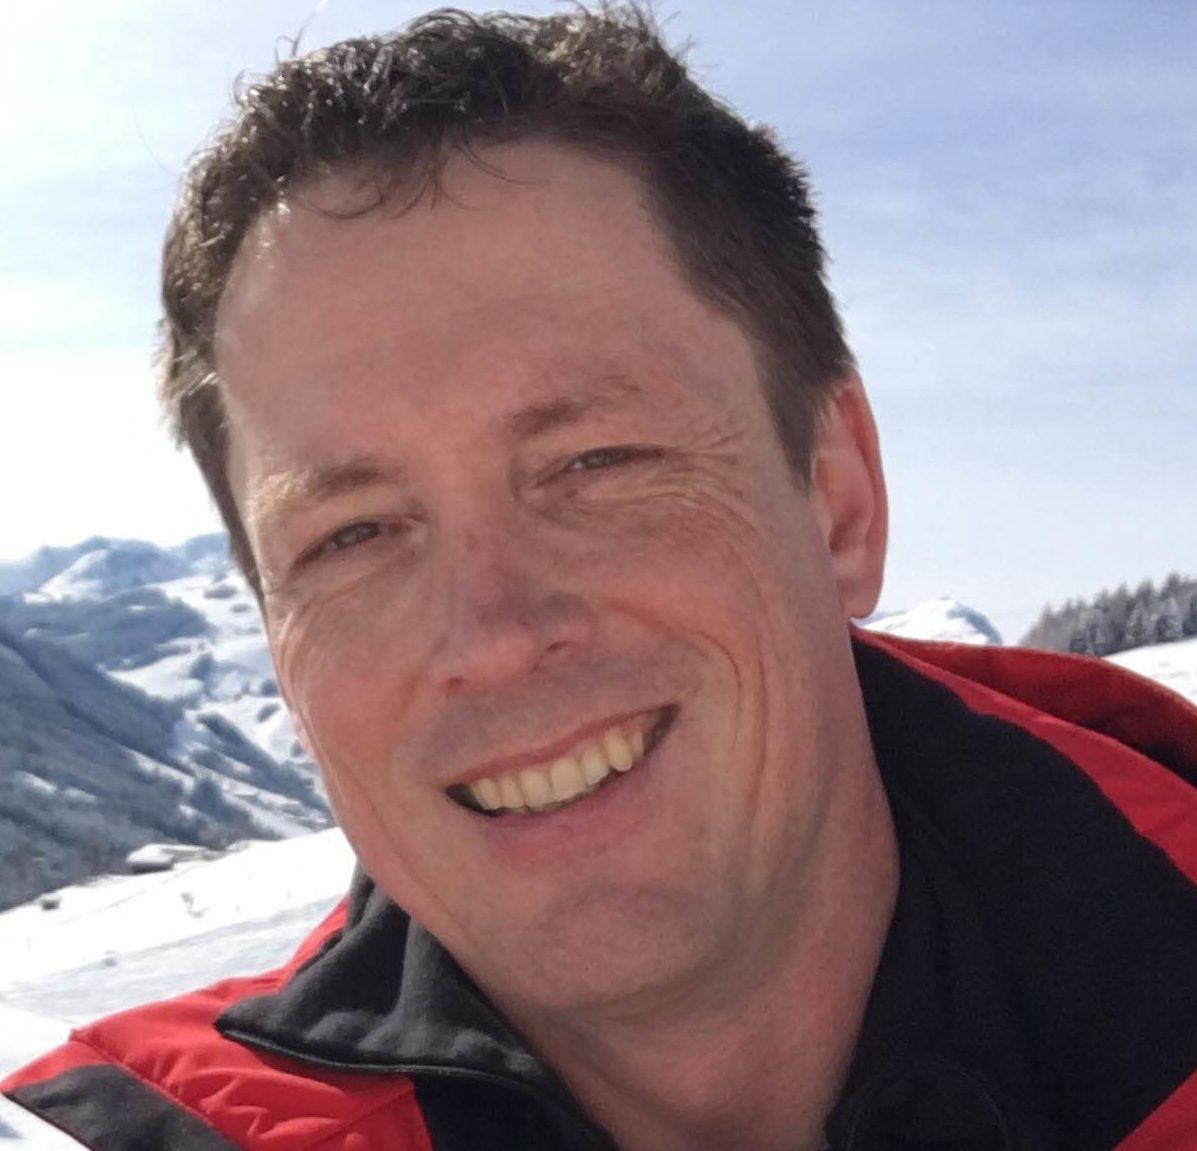 Candid of Sjaak Overgaauw, skiing in mountains